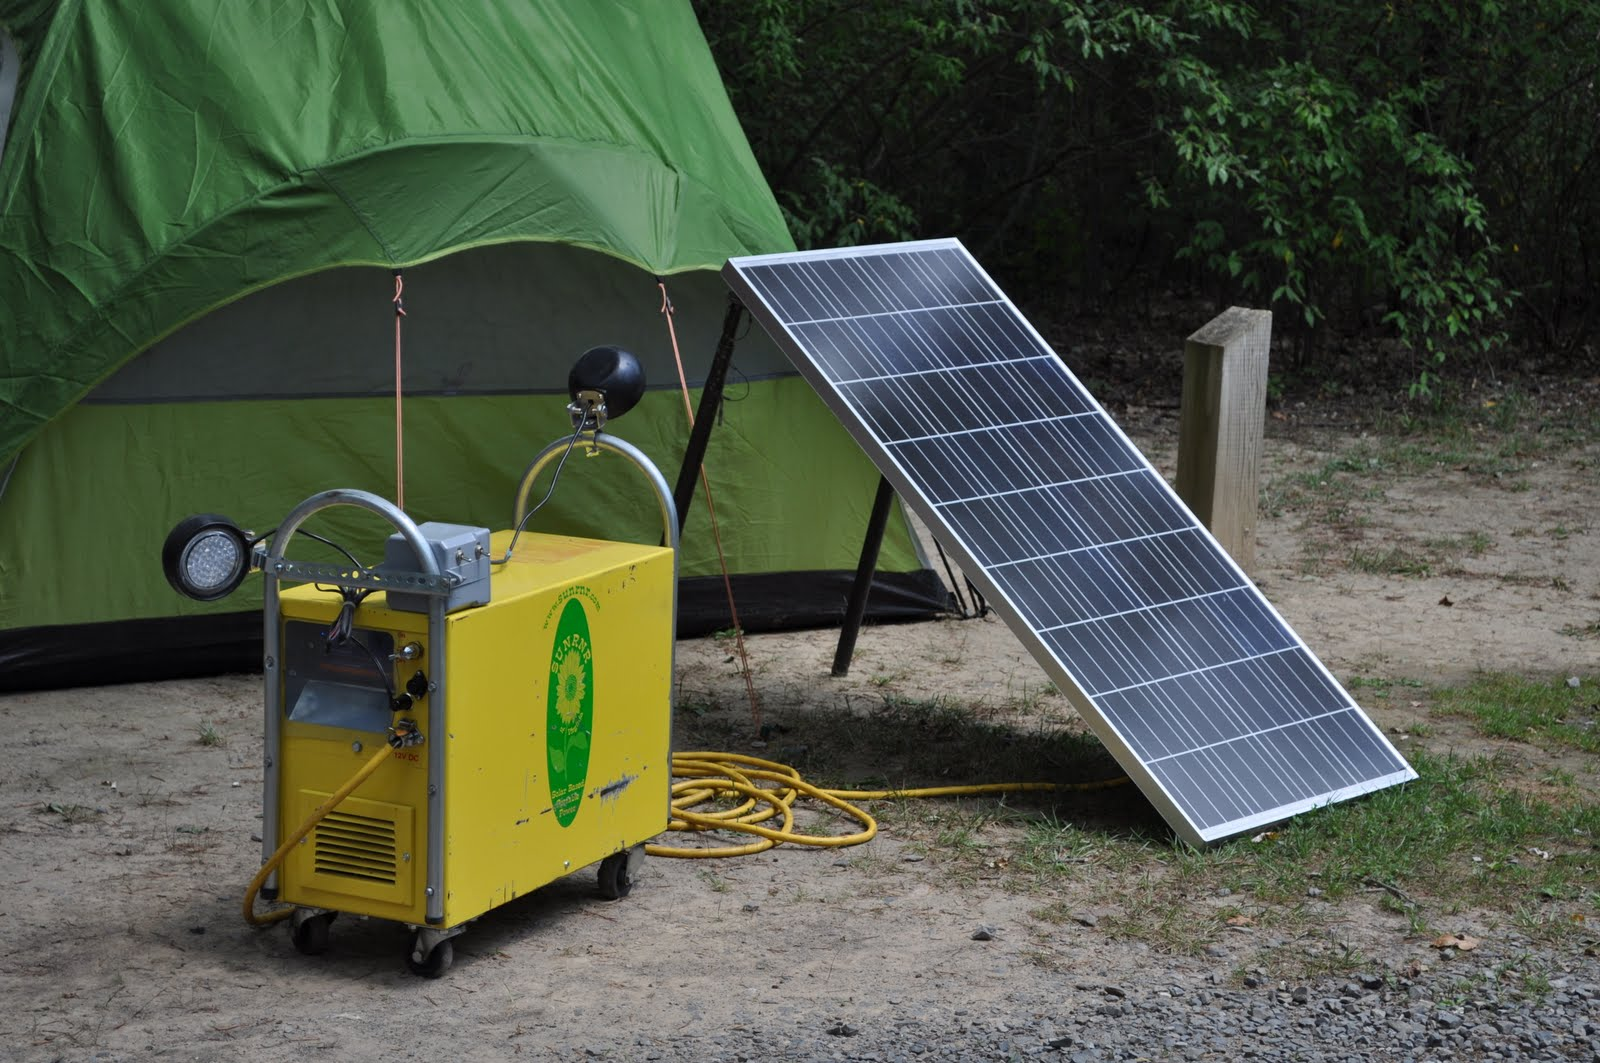 ... generator to field test the sun runner portable backup solar generator